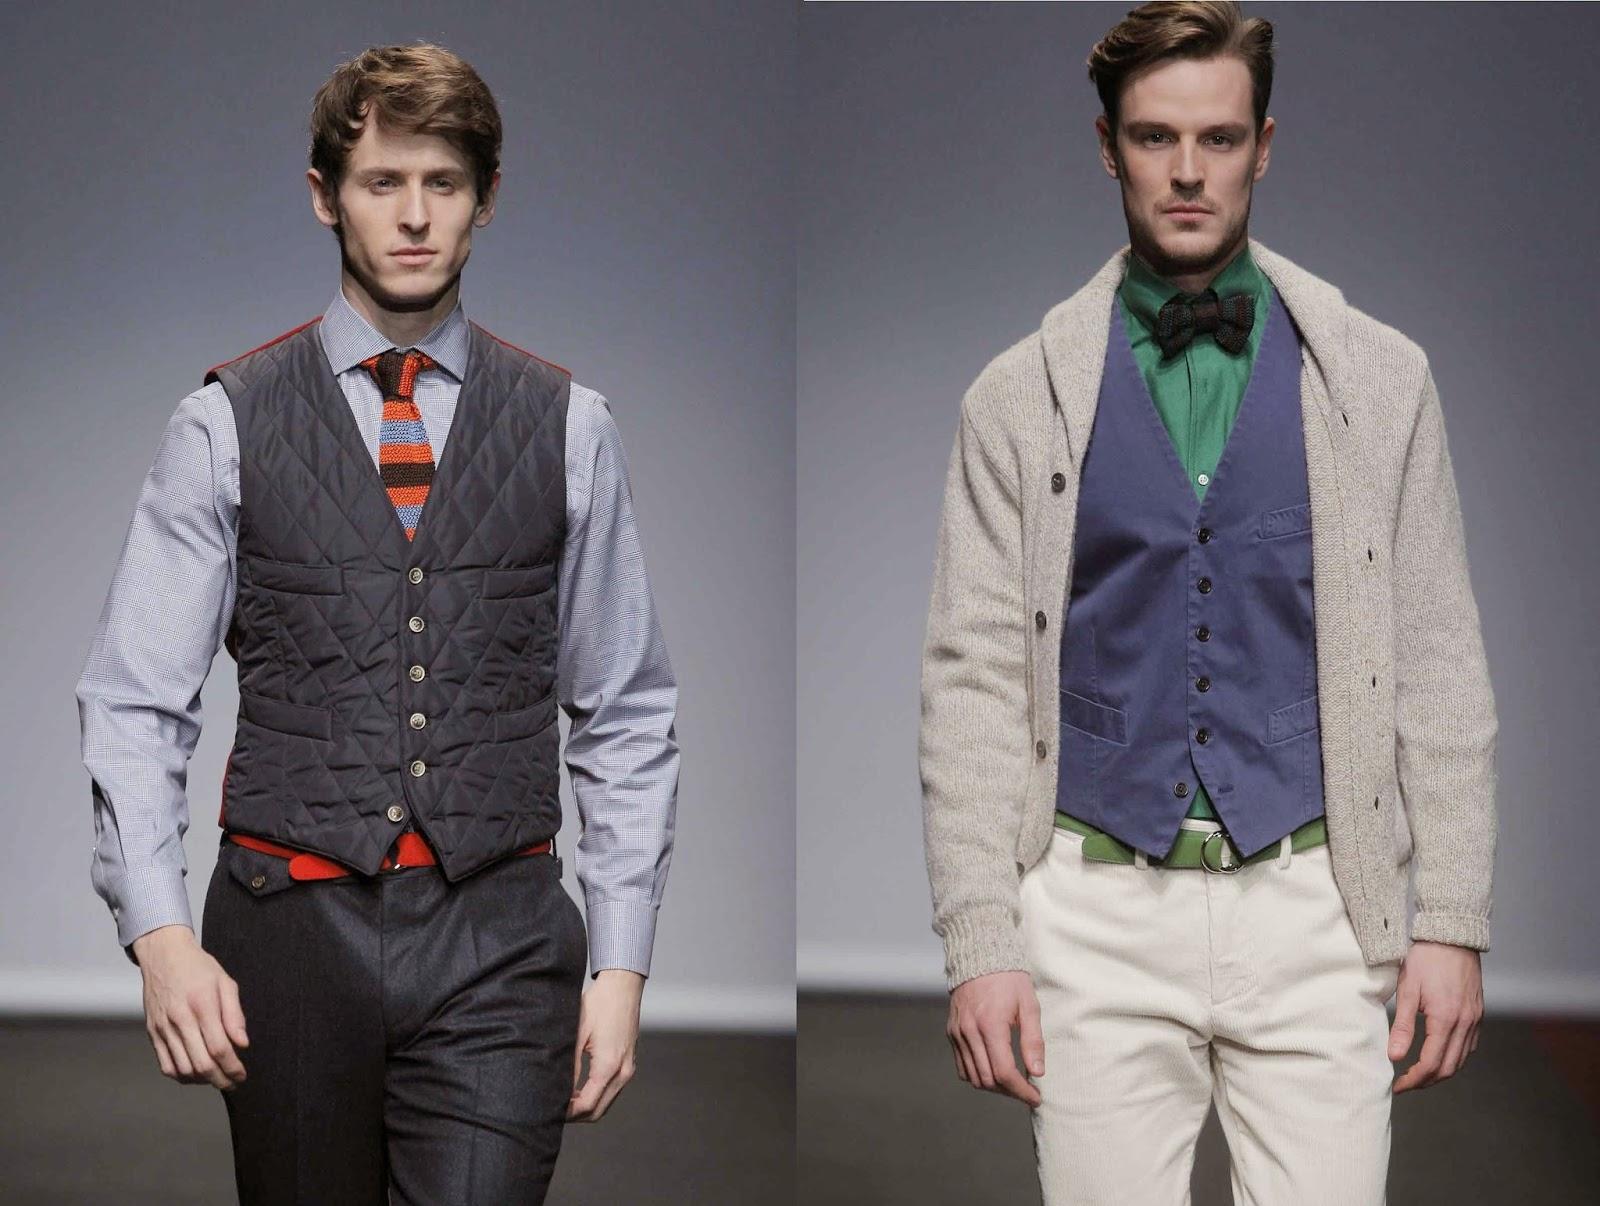 casual, Cremieux, Fall 2015, MFSHOW, otoño invierno, Suits and Shirts, Madrid, menswear, moda hombre, moda masculina, Men,